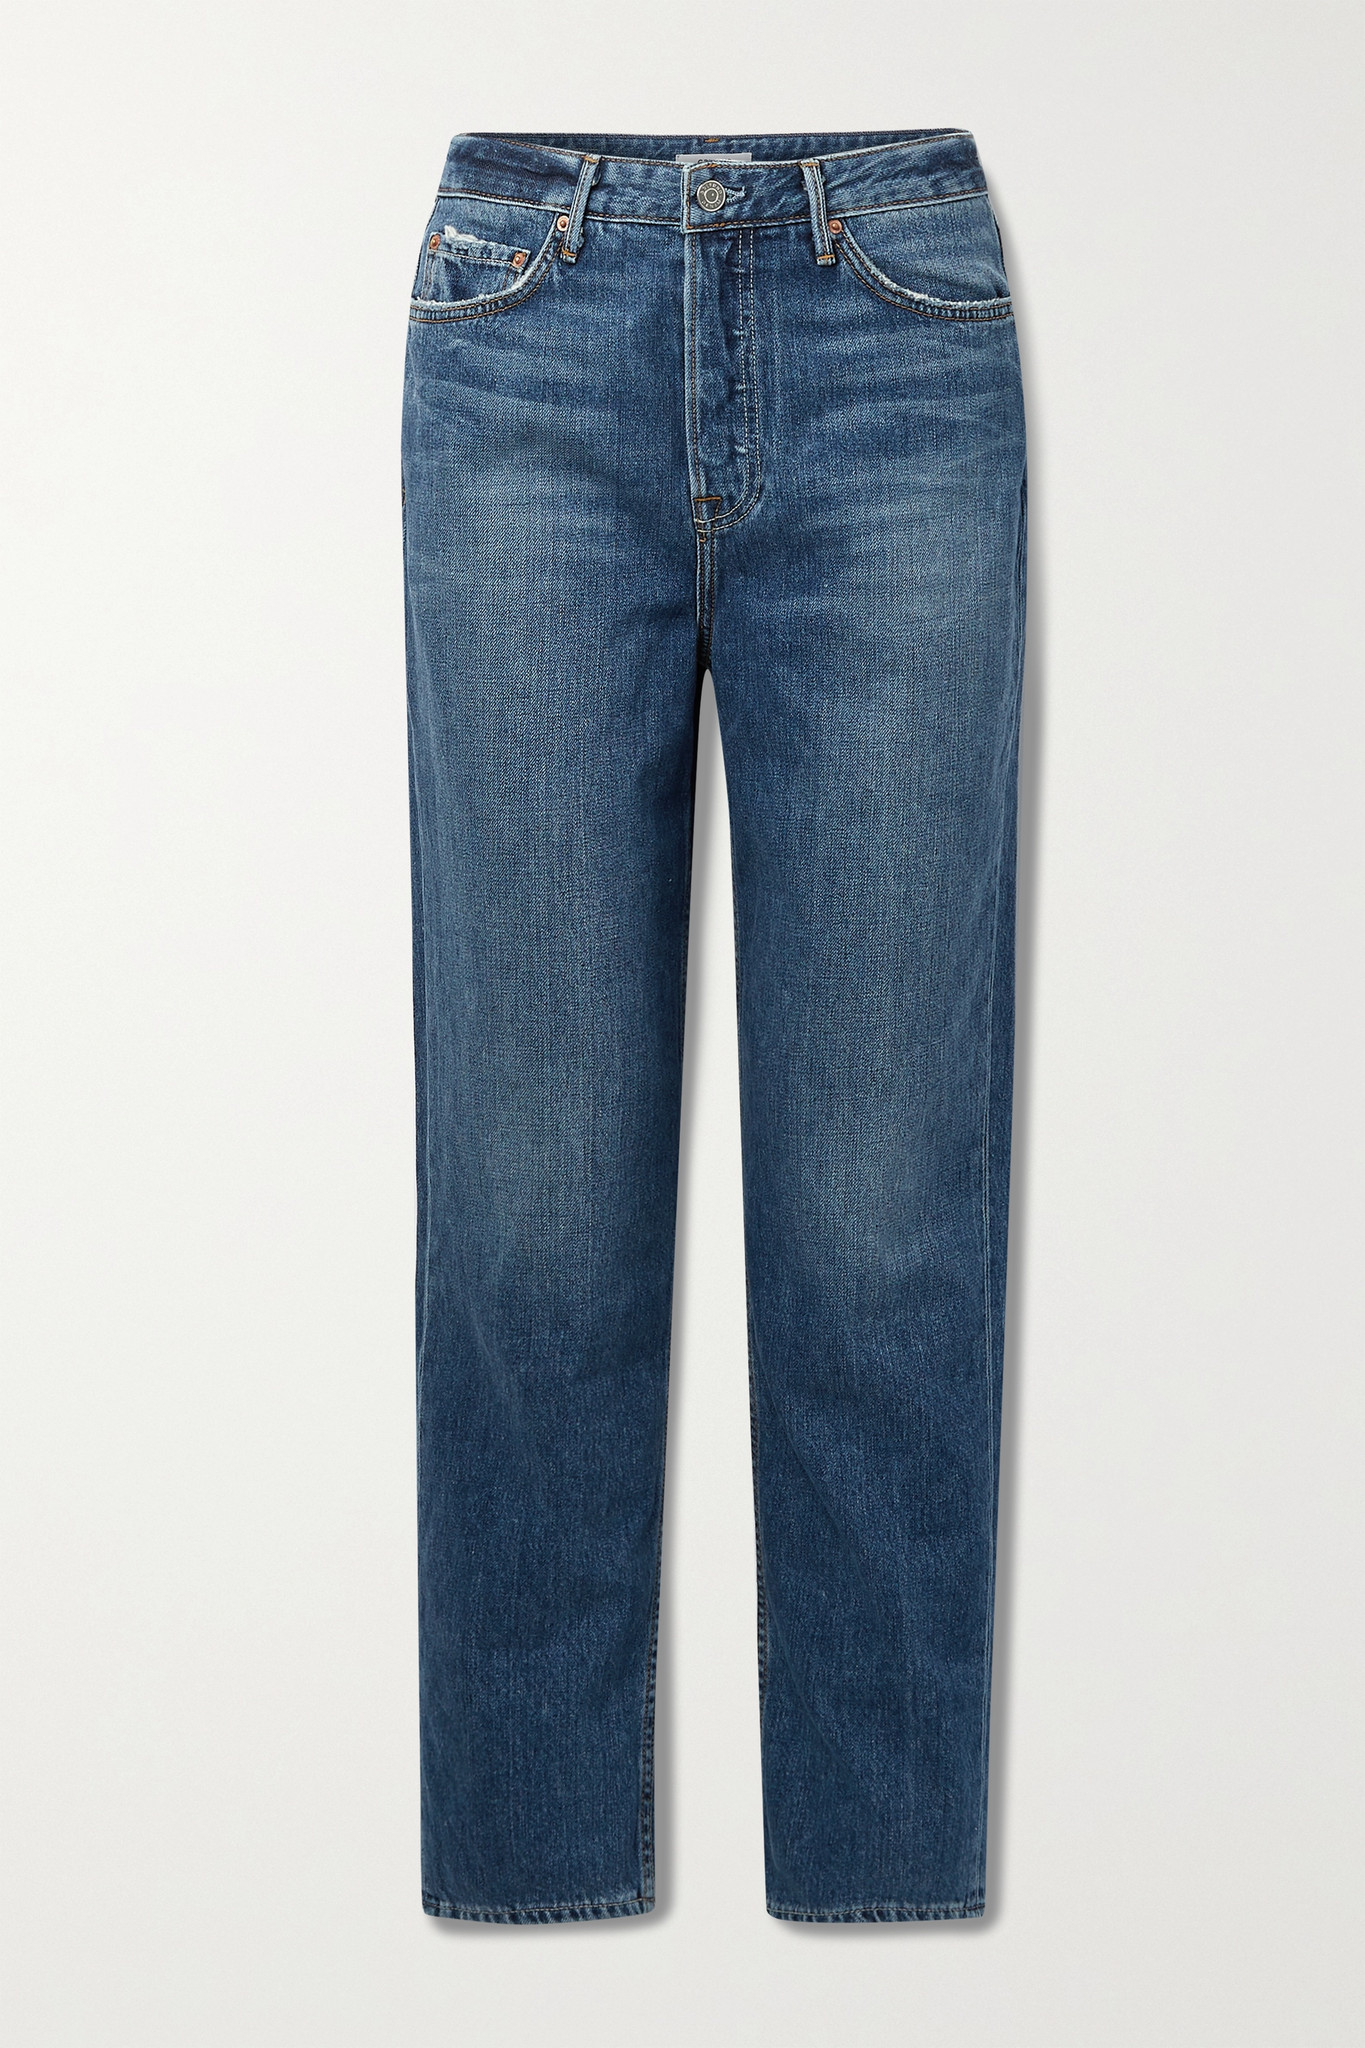 GRLFRND - Devon 高腰直筒牛仔裤 - 蓝色 - 24